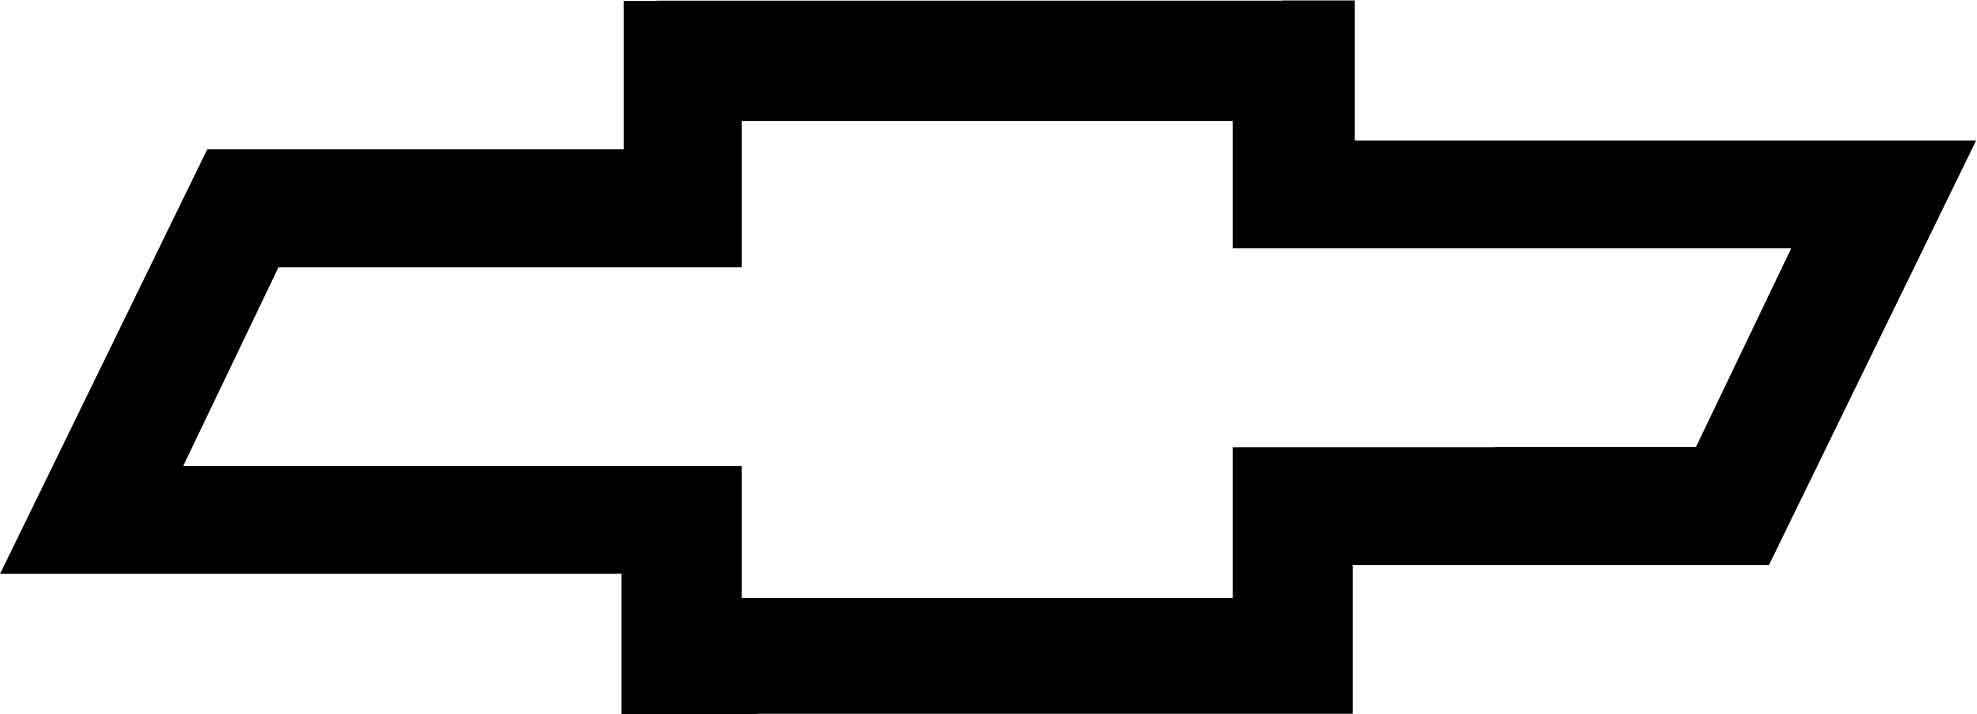 Drawn log Clipart Emblem  Chevrolet Chevy